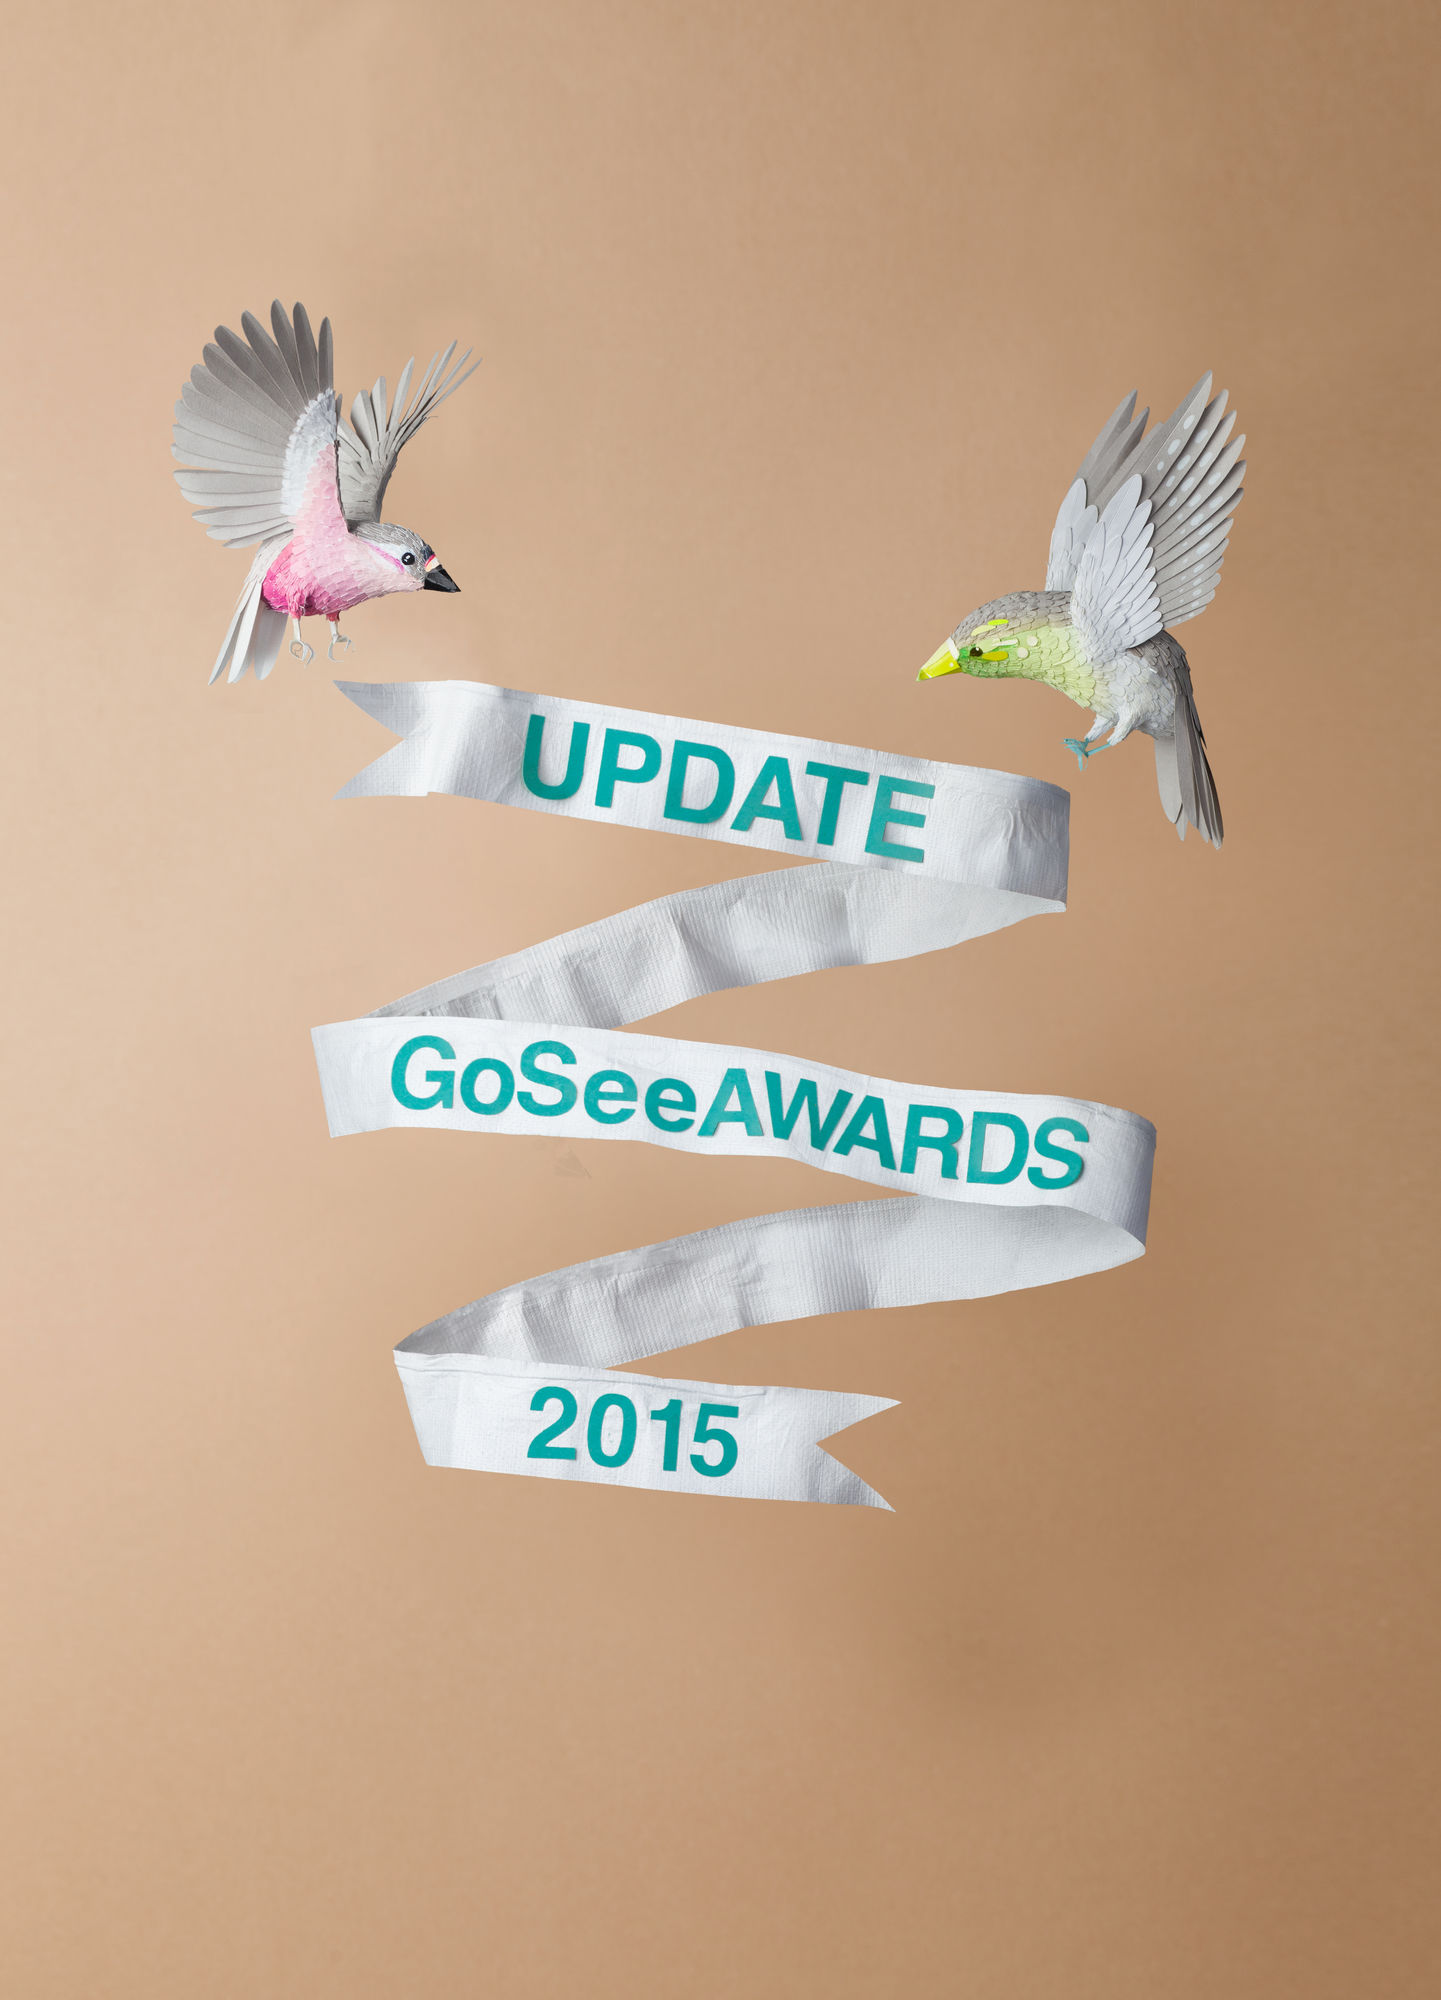 GOSEE AWARDS 2015